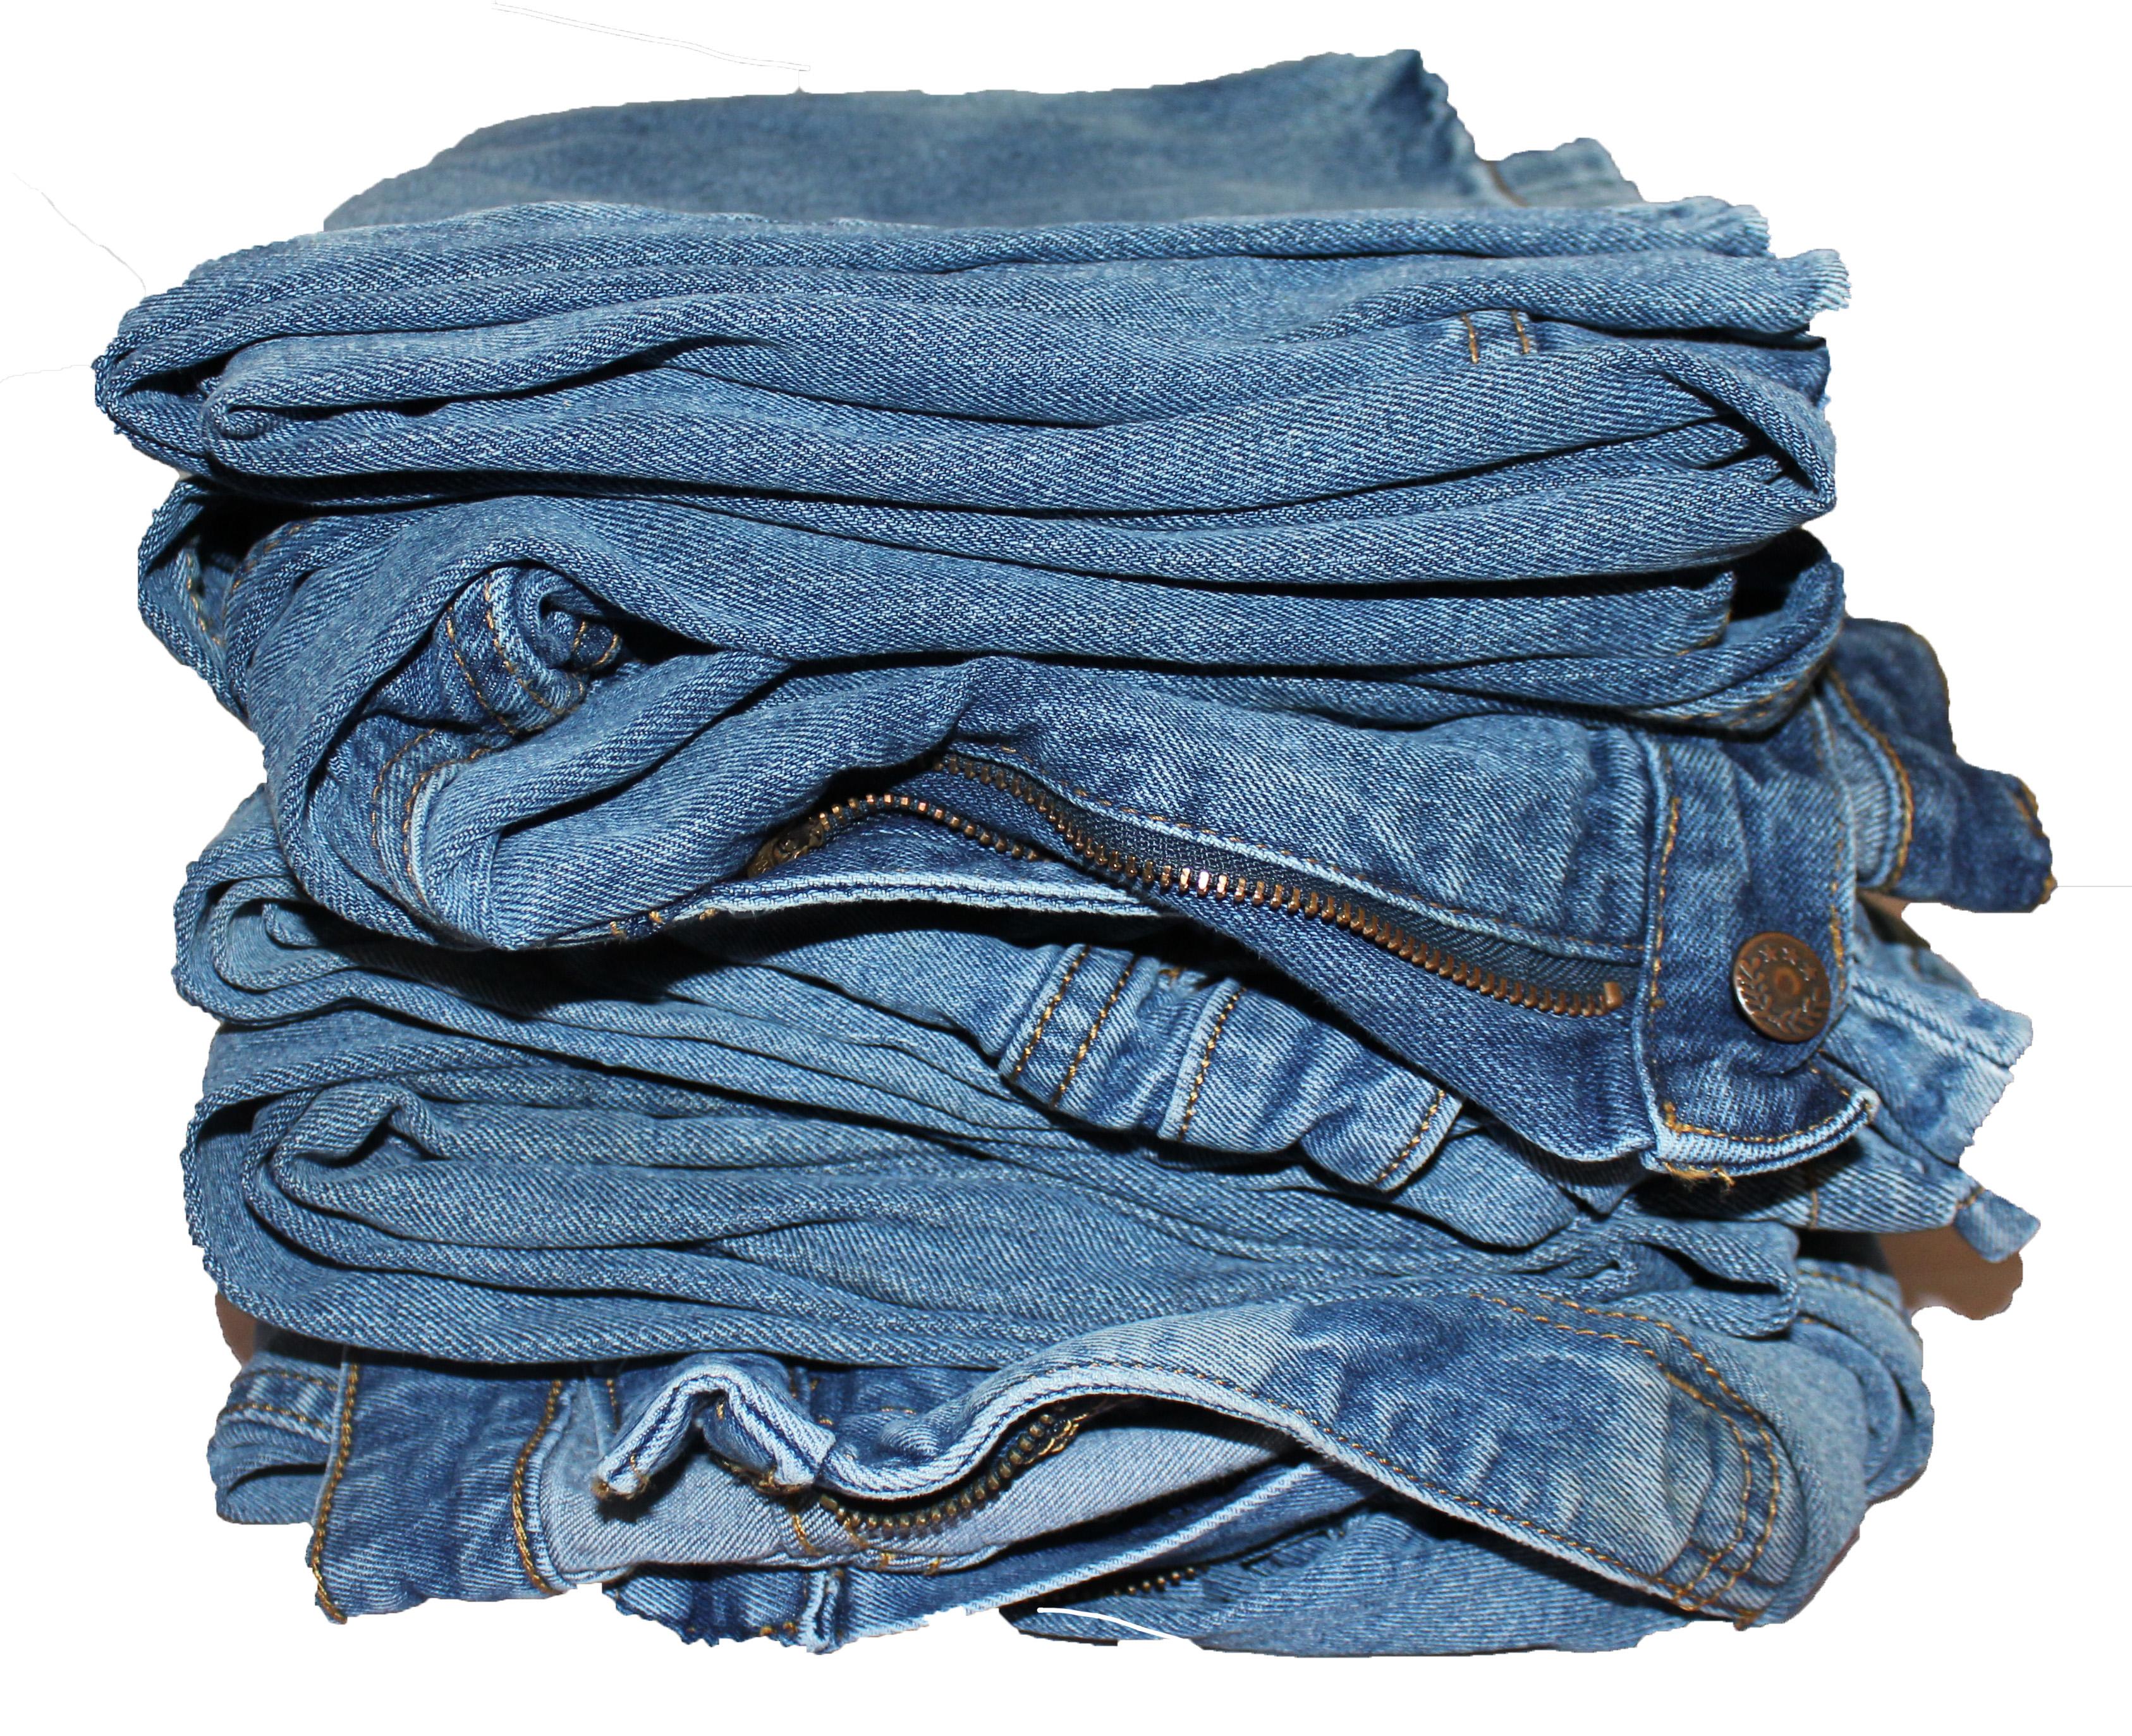 5-pairs-jeans-edited-1.jpg